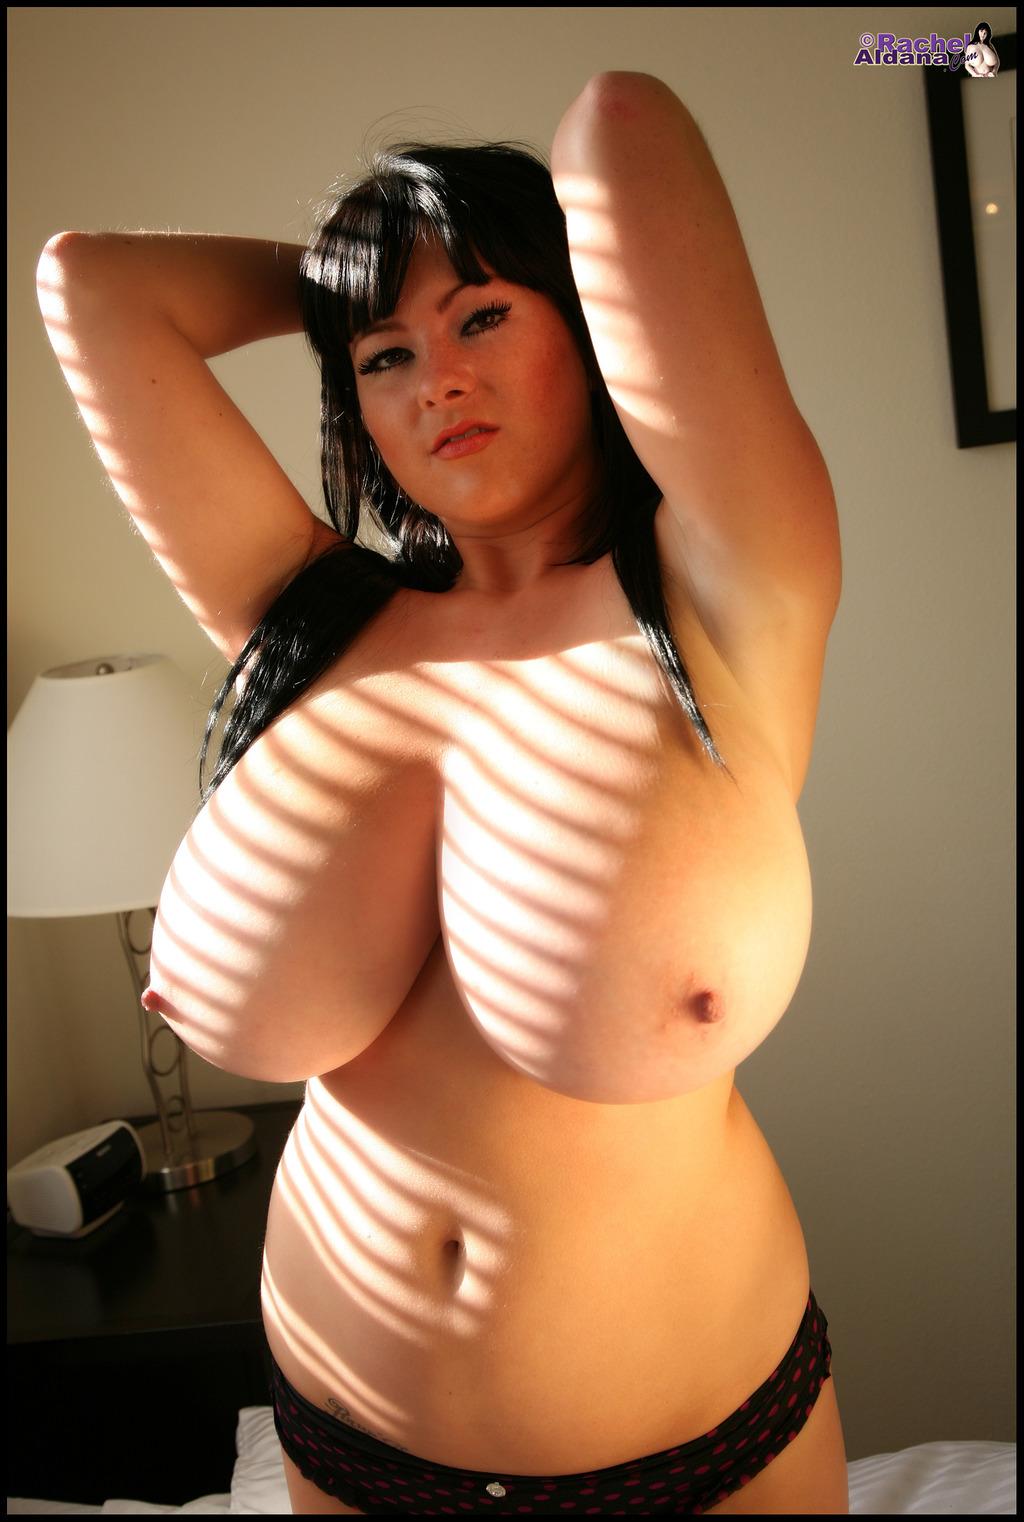 rachel-aldana-vagina-hot-chinese-girls-nude